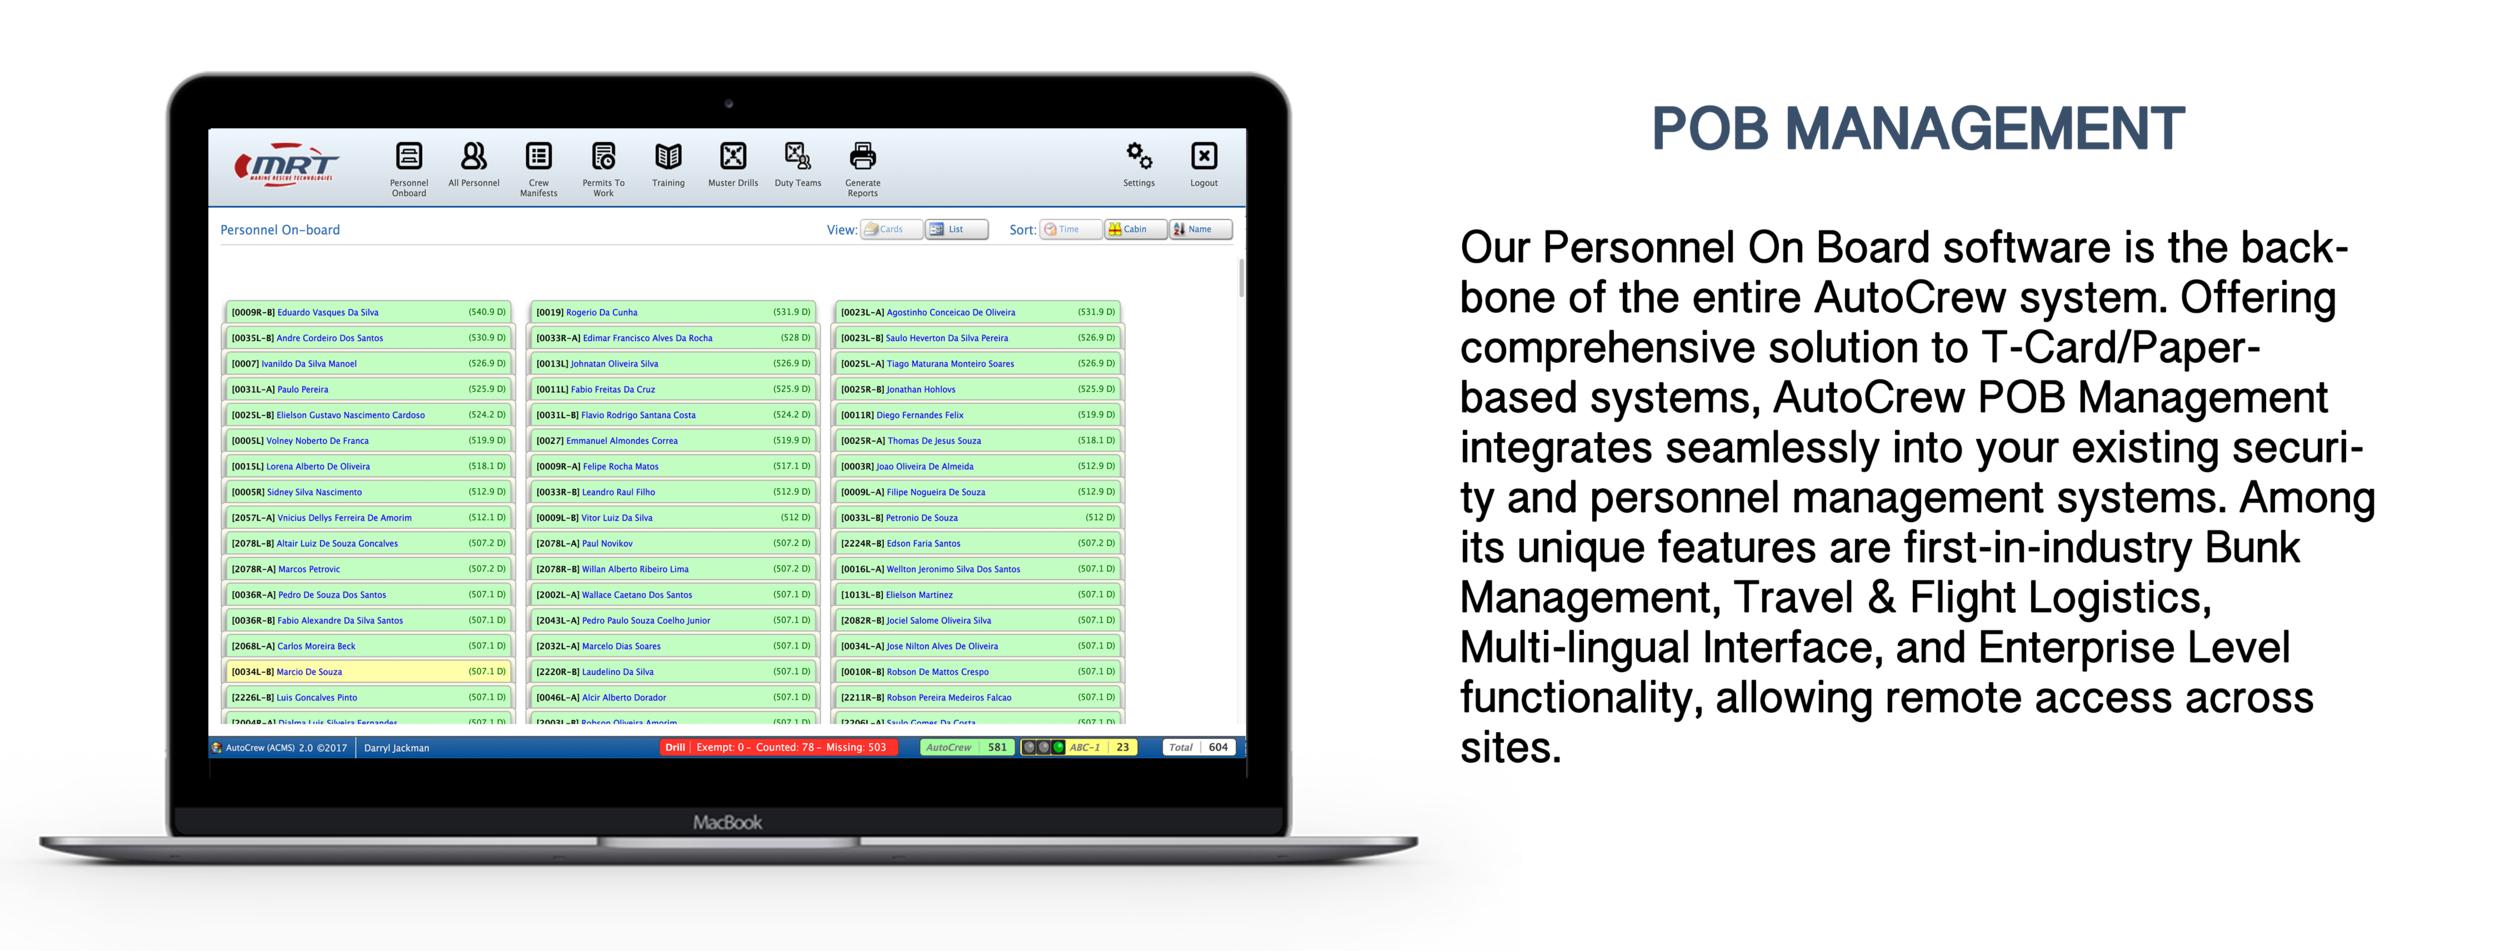 ScreenshotPOBManagement3.png